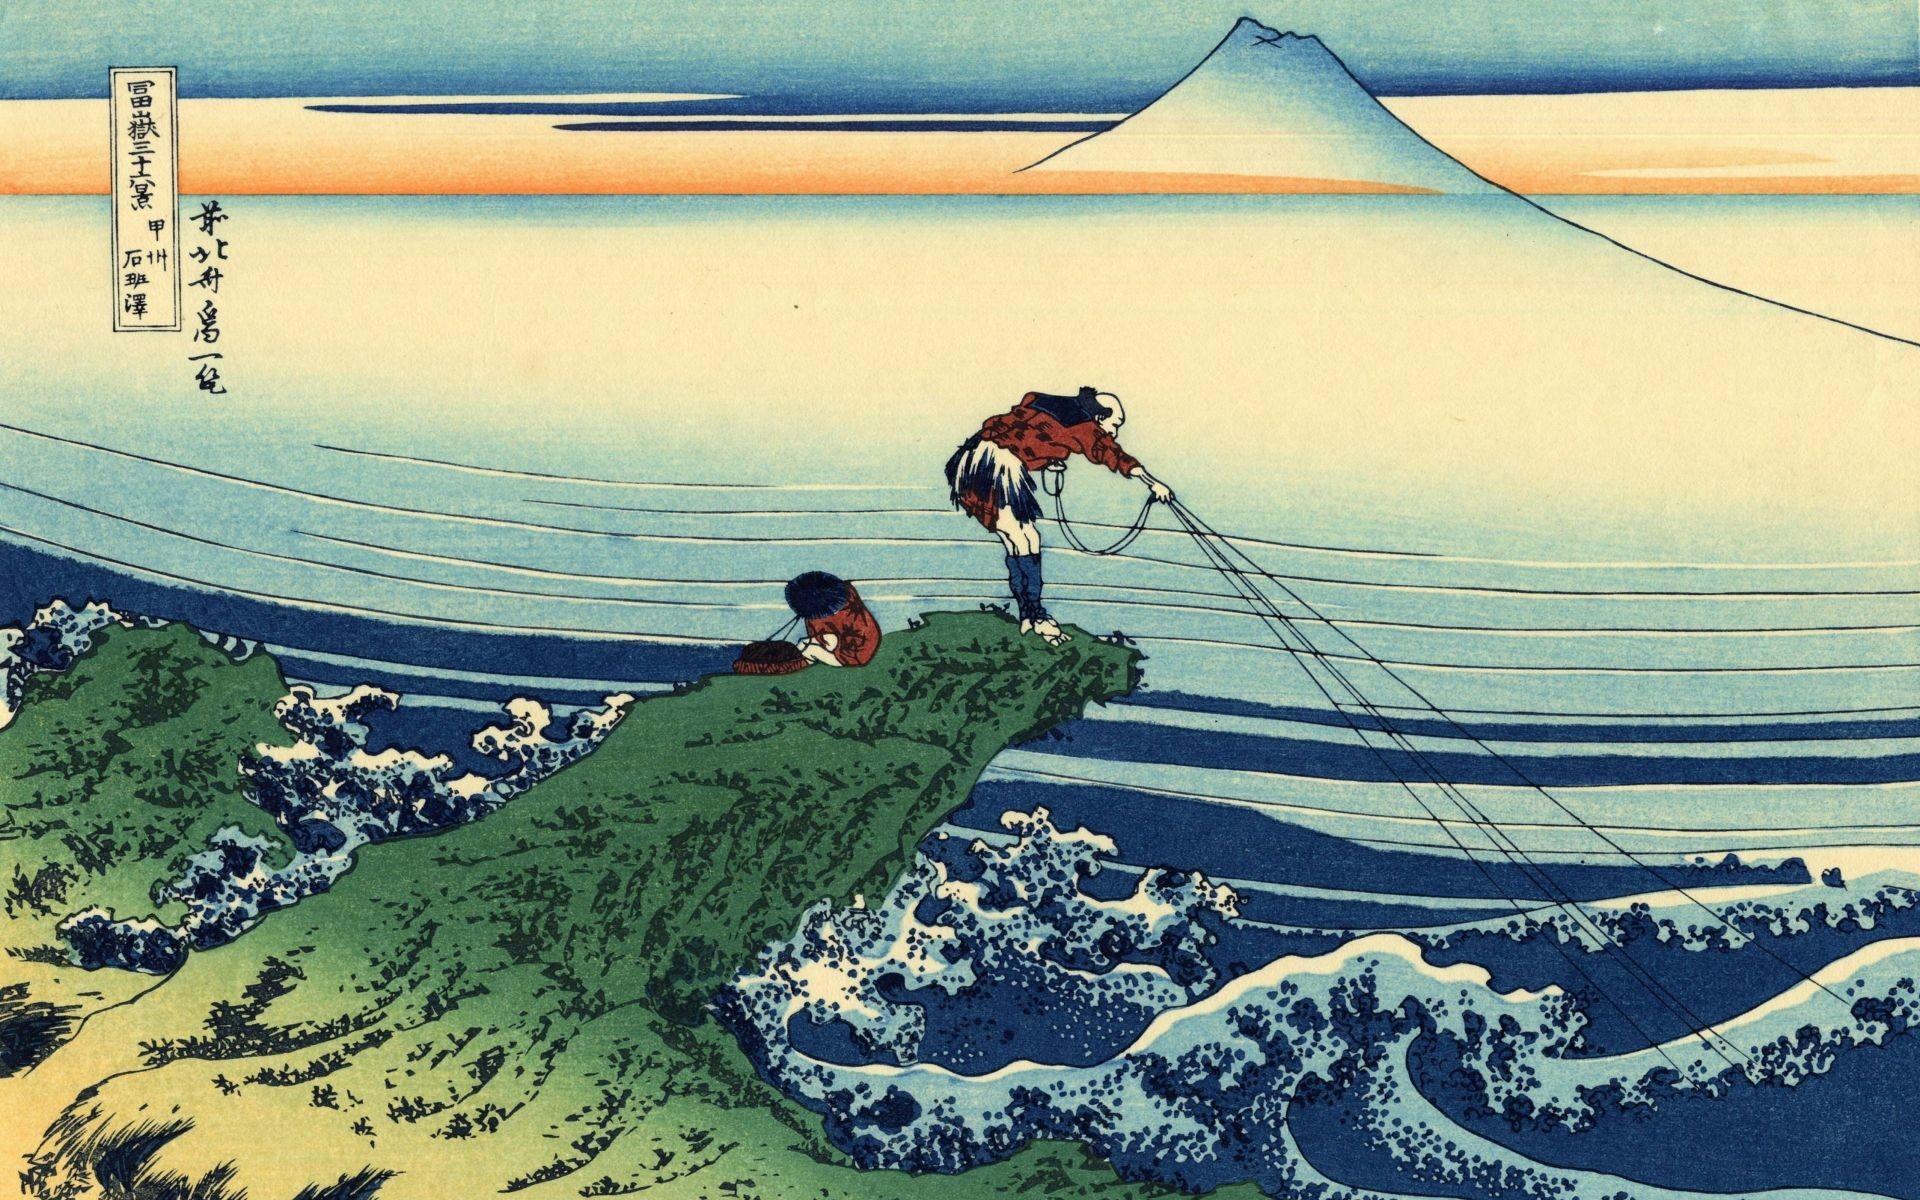 Res: 1920x1200, katsushika-hokusai-thirtysix-views-of-mount-fuji-wallpaper.